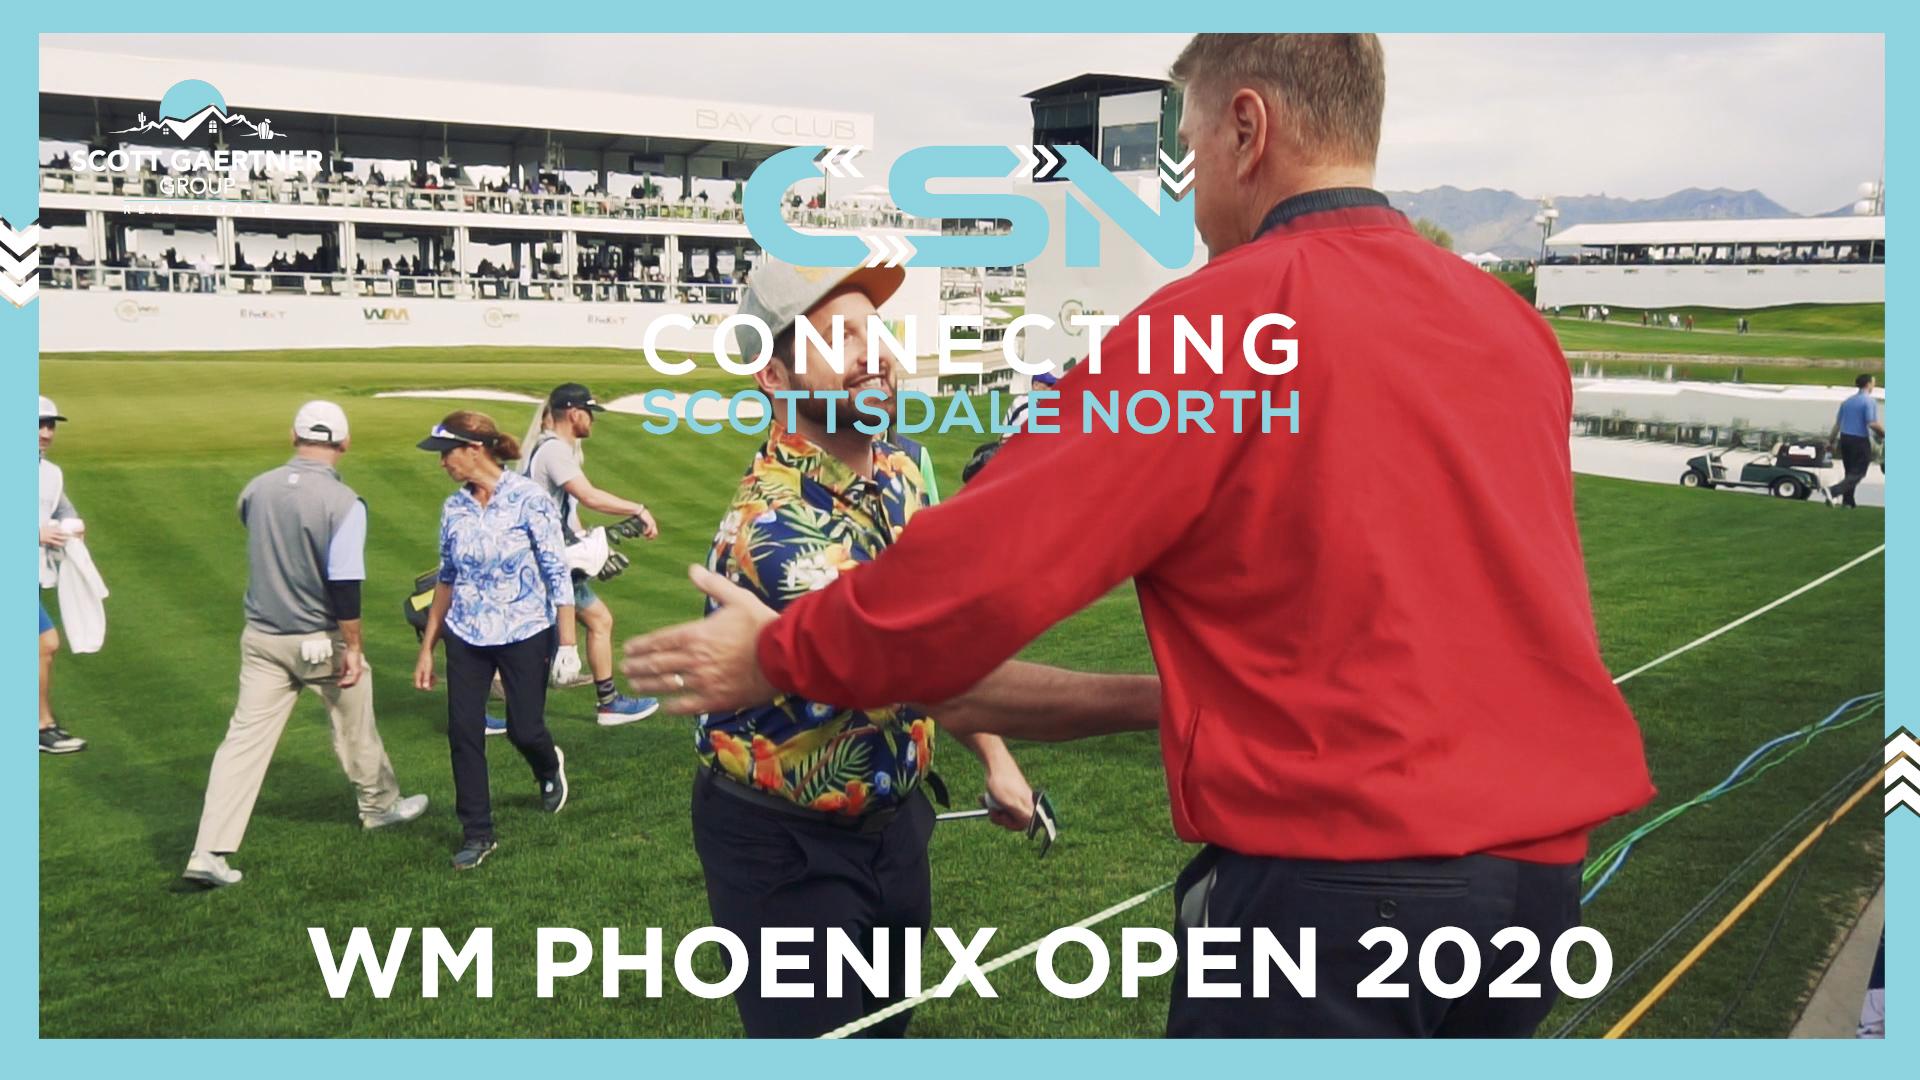 WM Phoenix Open 2020